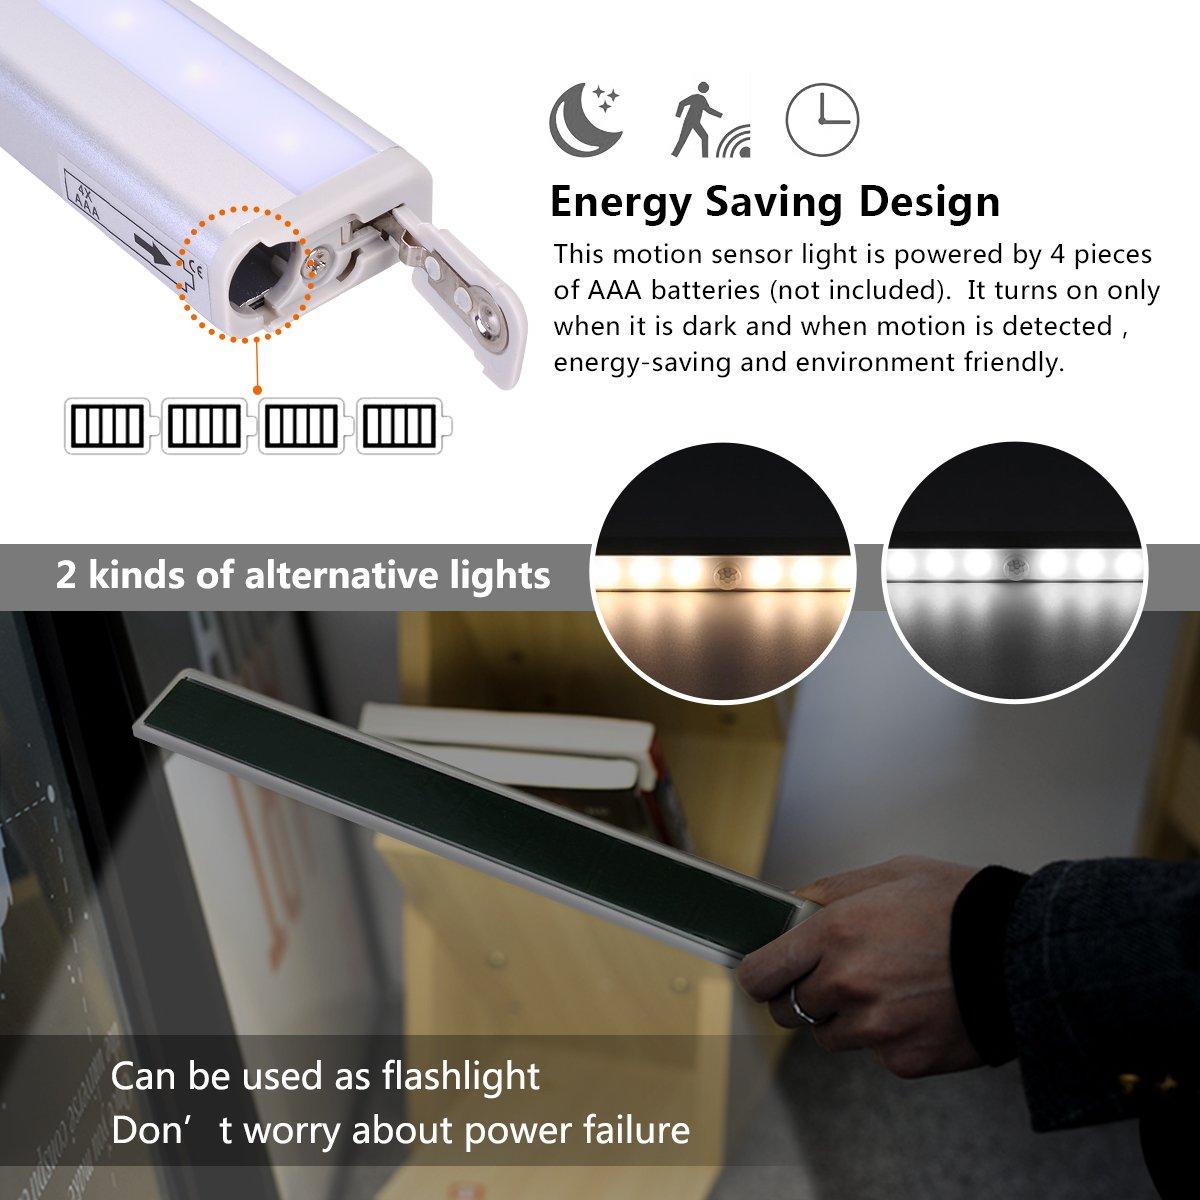 OZUAR Magnético Movimiento Sensor Luces, 10 Leds Lámpara de Pared Automática Alimentado por Batería, Pack de 2, Blanco Cálido/Blanco Frío (Plata): ...